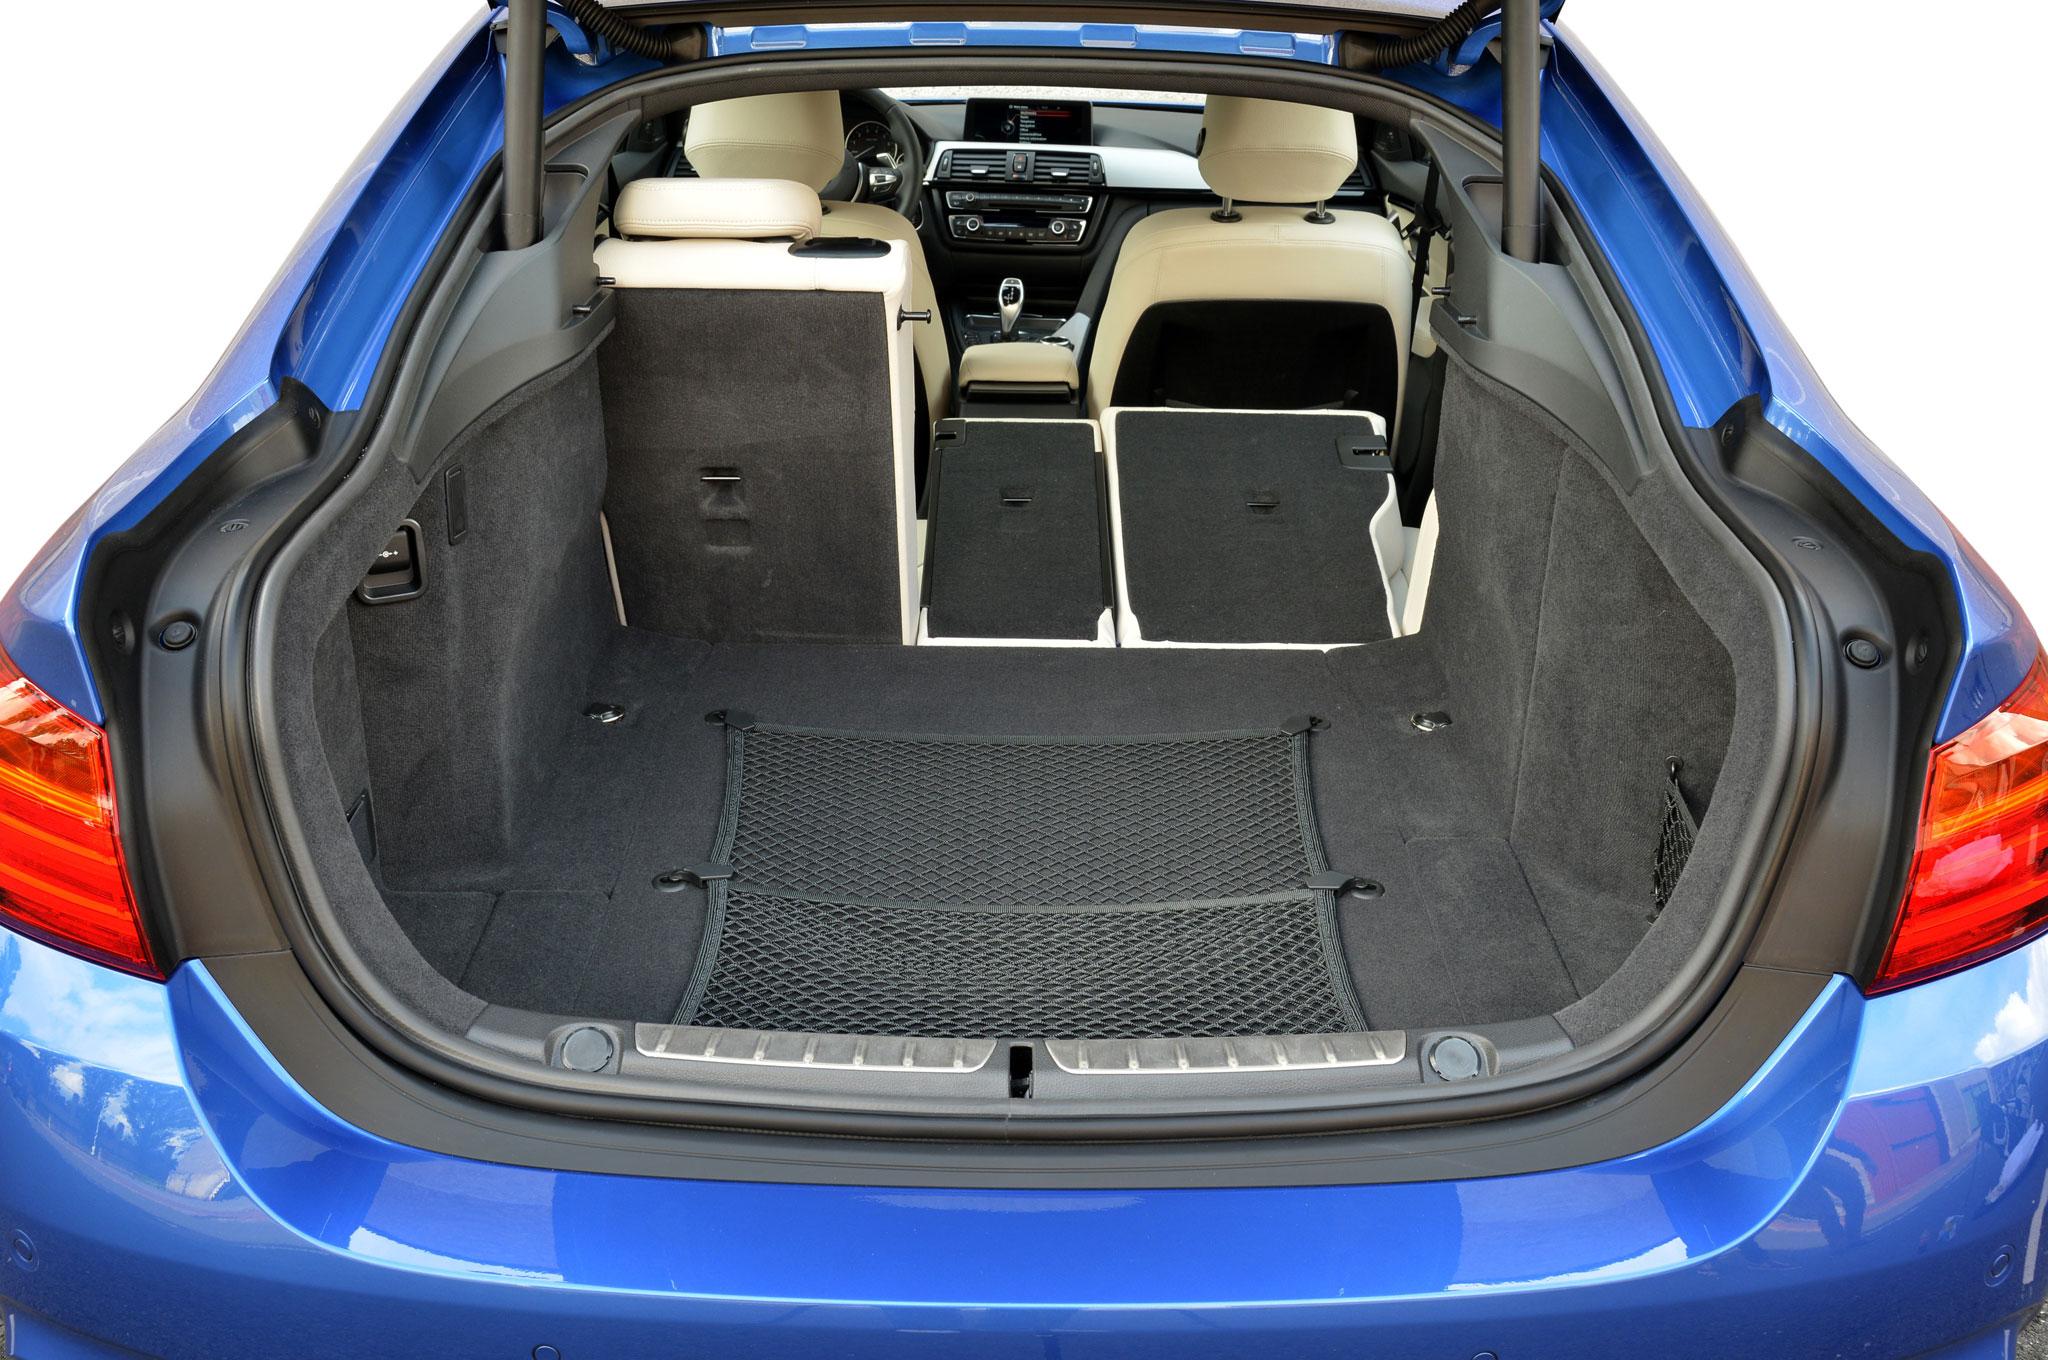 2015 bmw 428i xdrive coupe 0-60